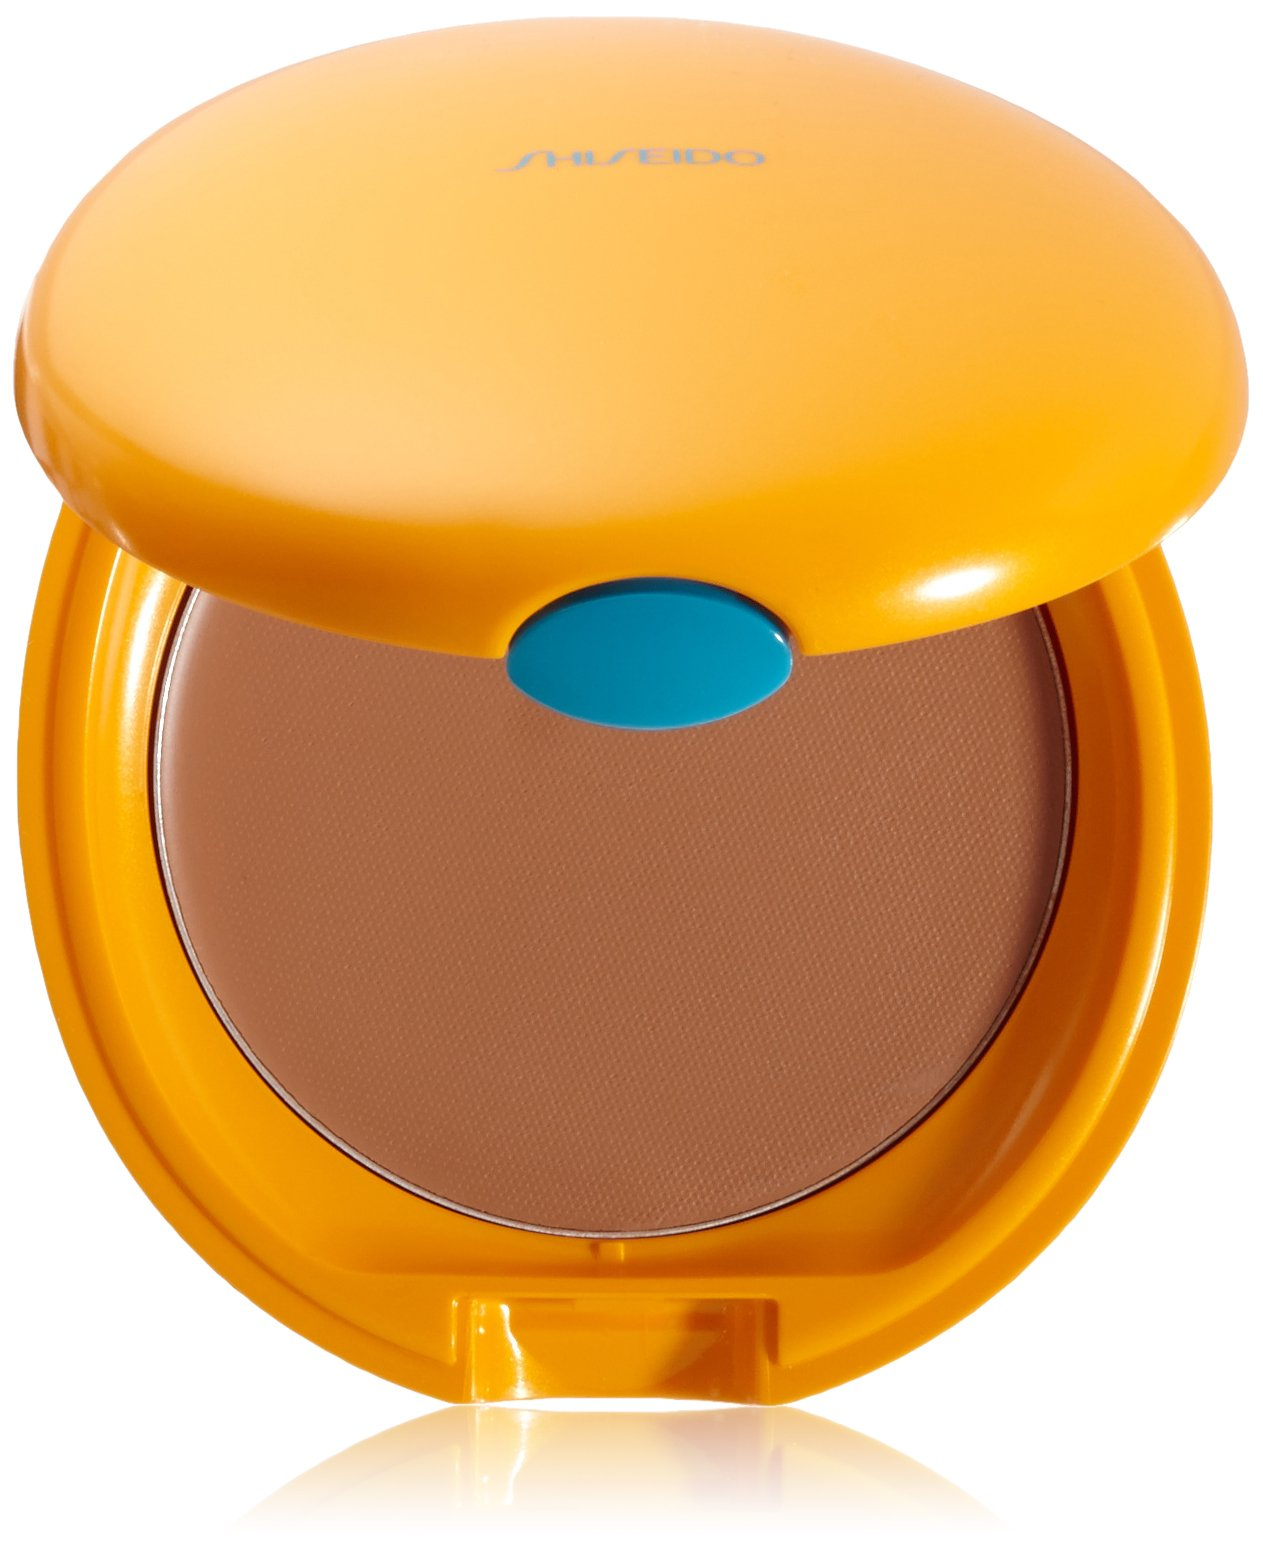 Shiseido Tanning Compact SPF 6 Foundation for Women, Honey, 1.8 Ounce